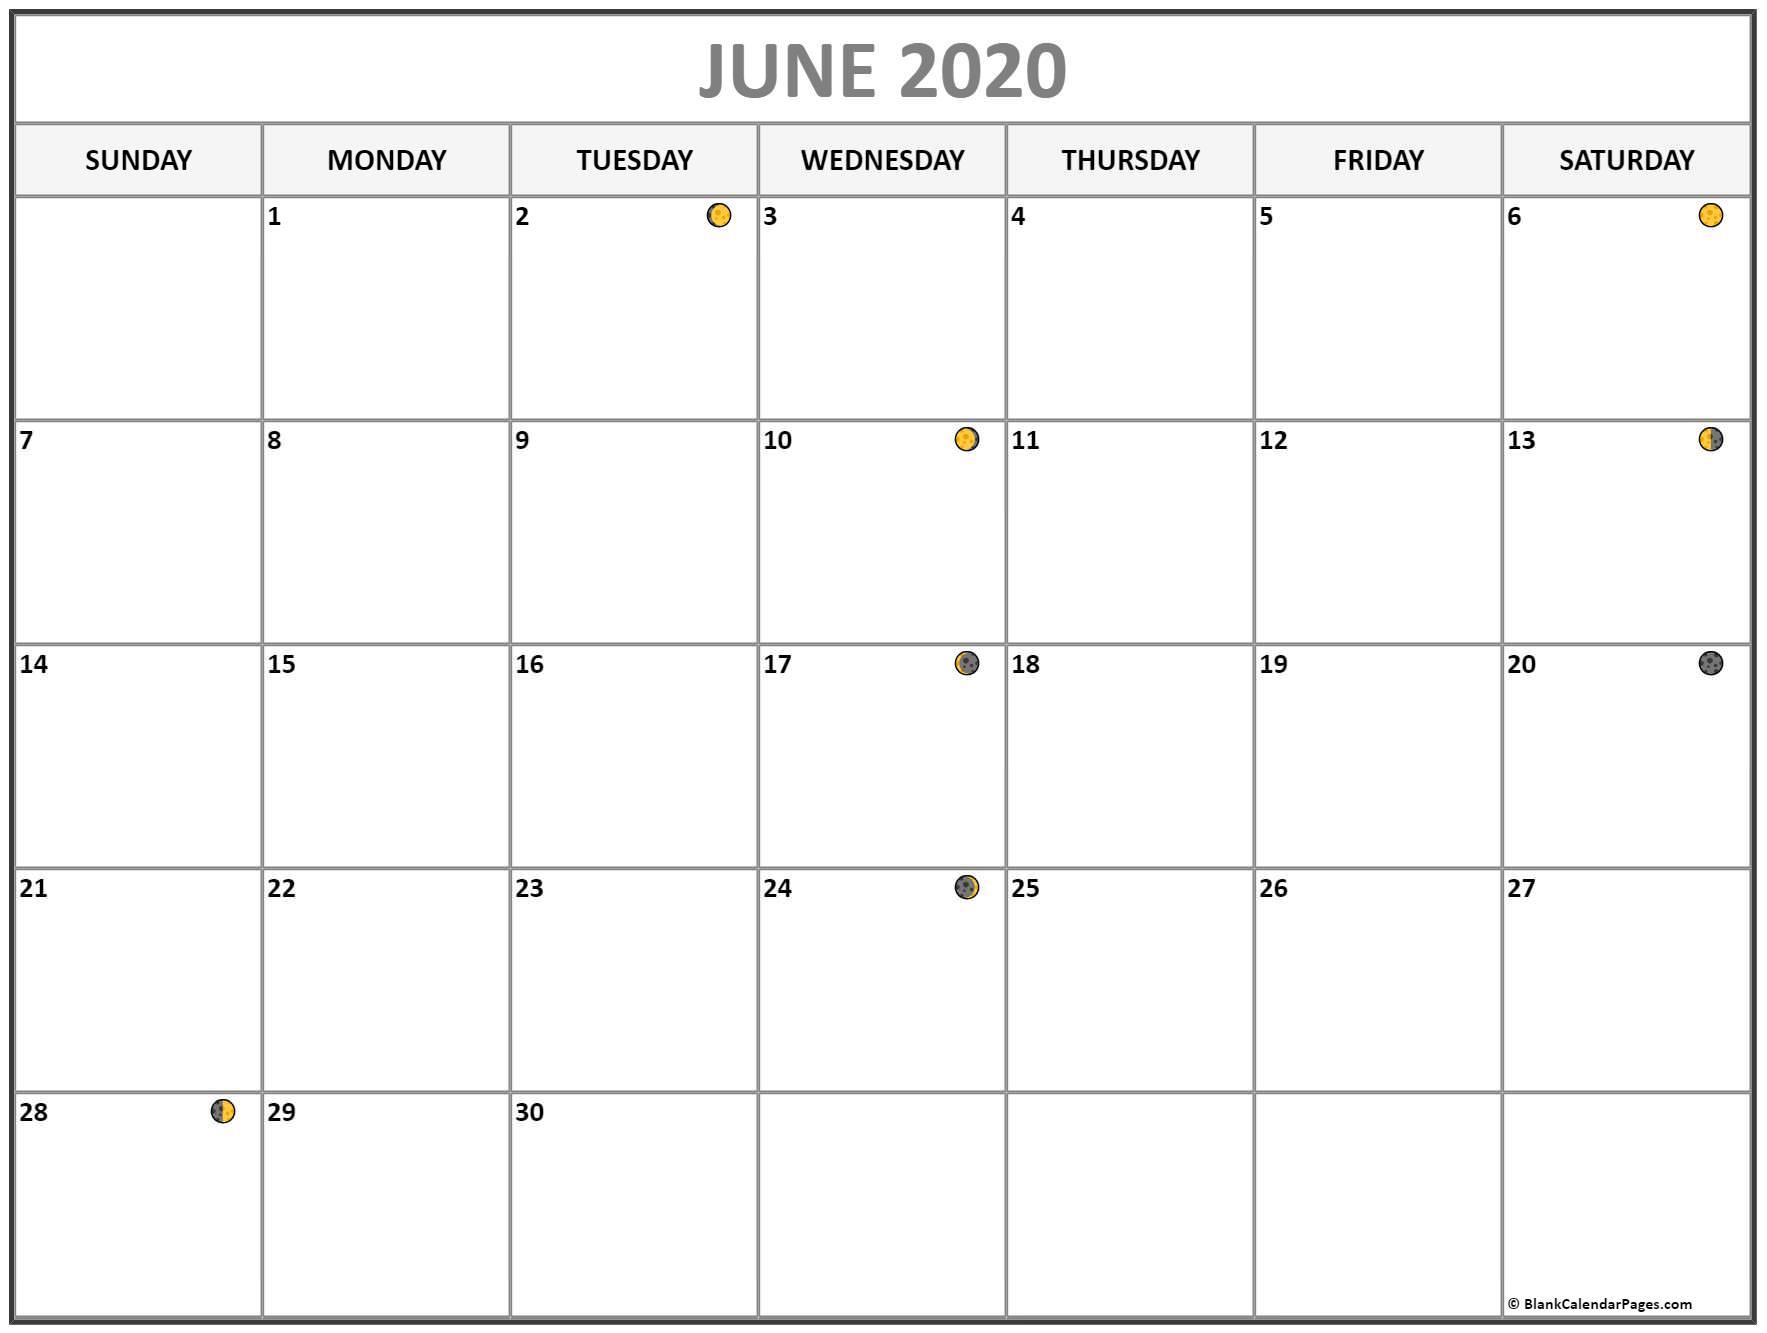 June 2020 Lunar Calendar Moon Phases